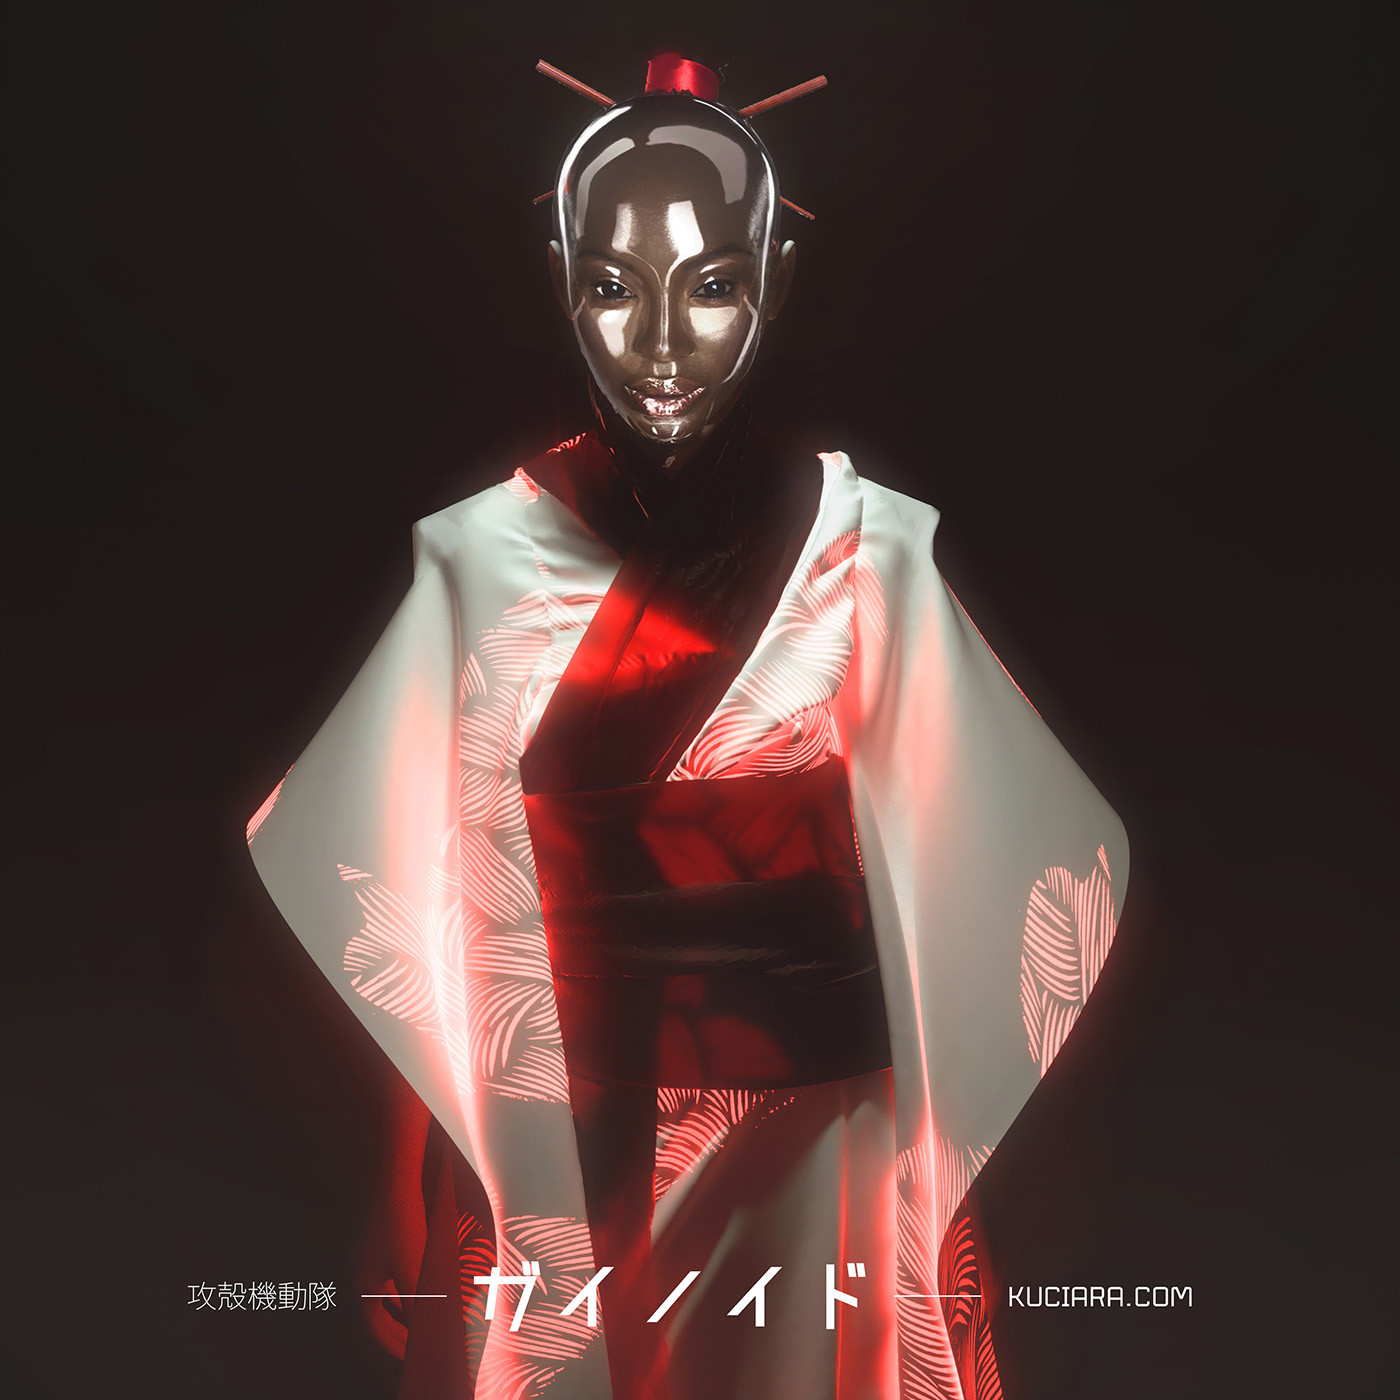 Maciej kuciara 150810 cha geisha kimono mk cam01 v004